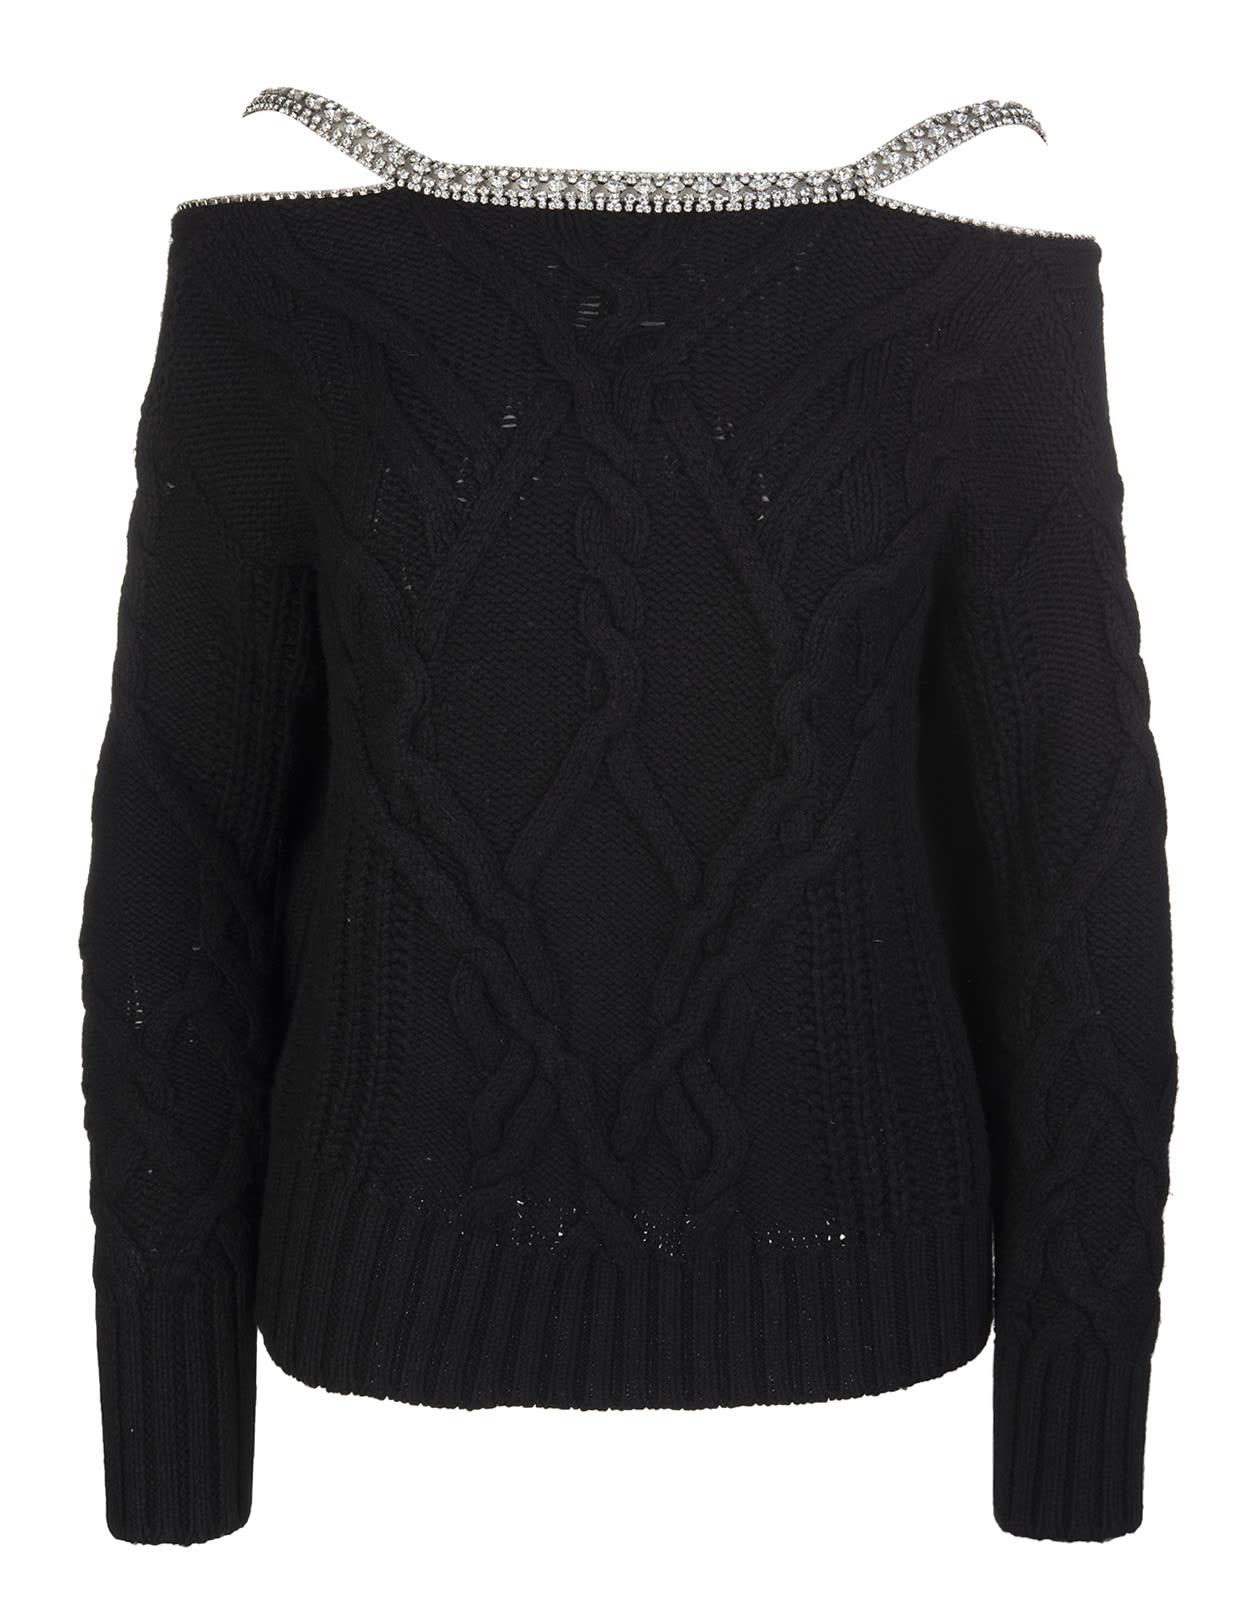 Black Sweater With Jewel Straps